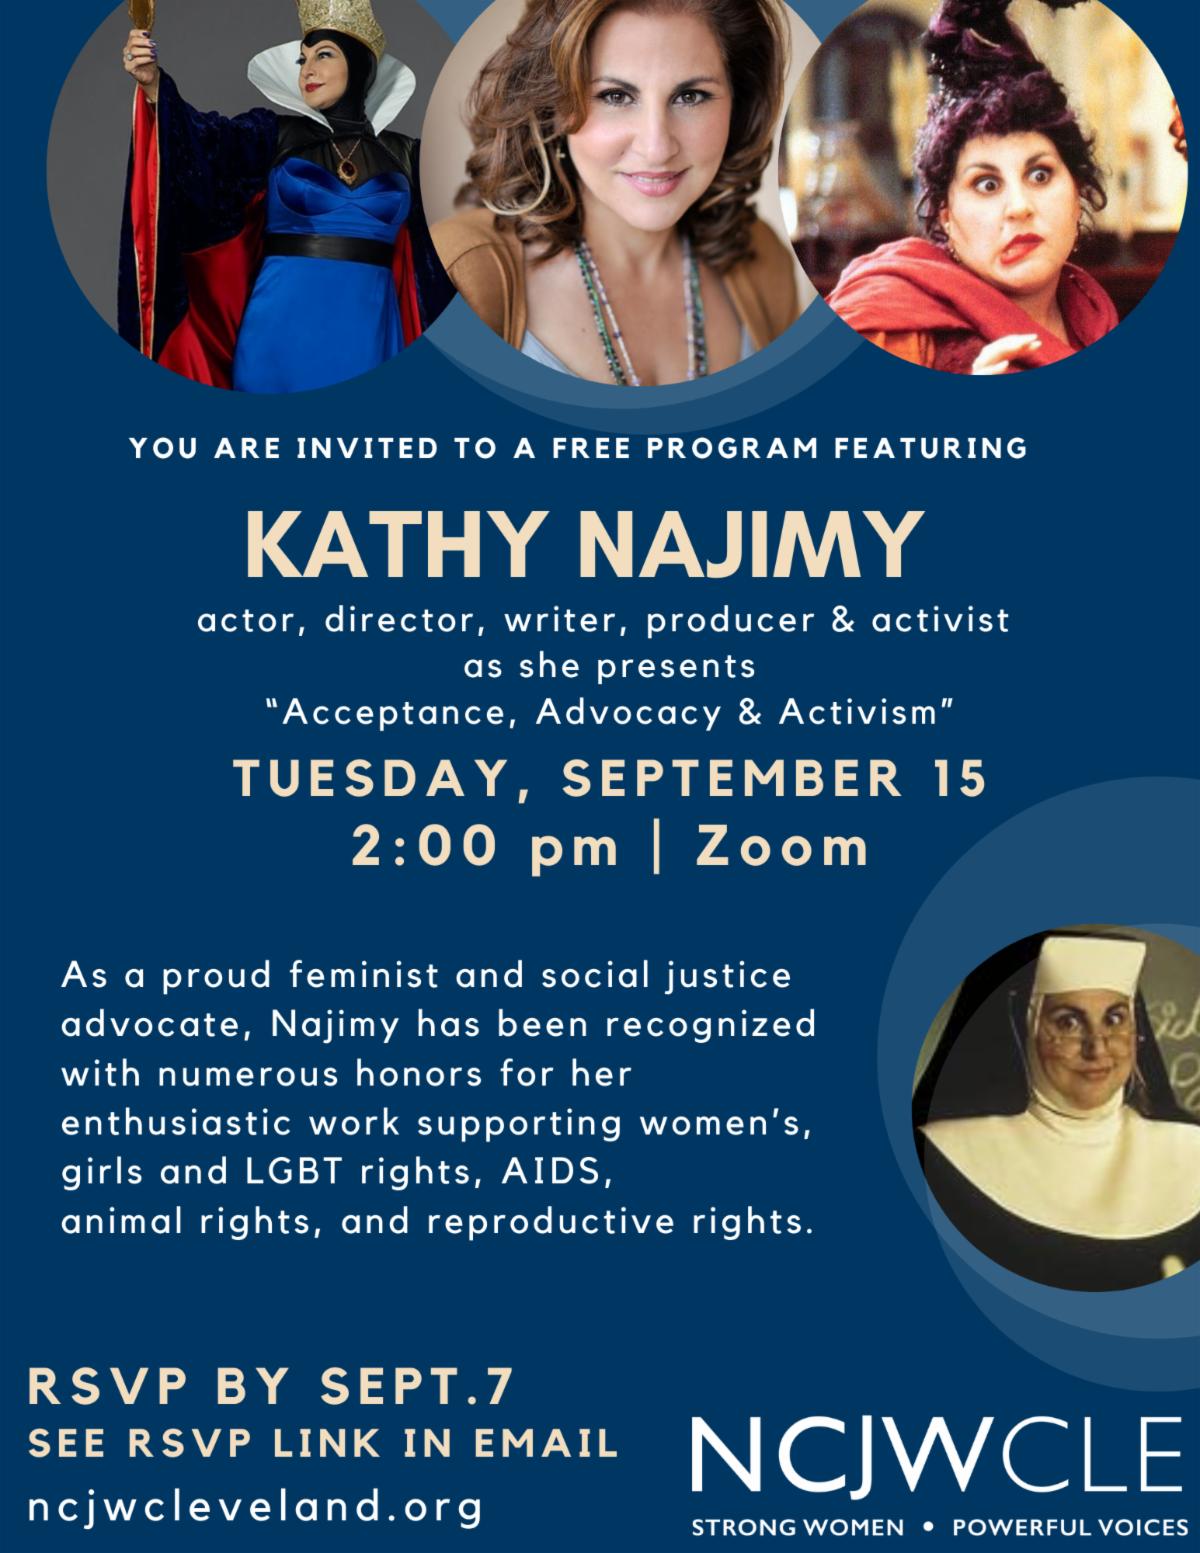 Flyer for Kathy Najimy event